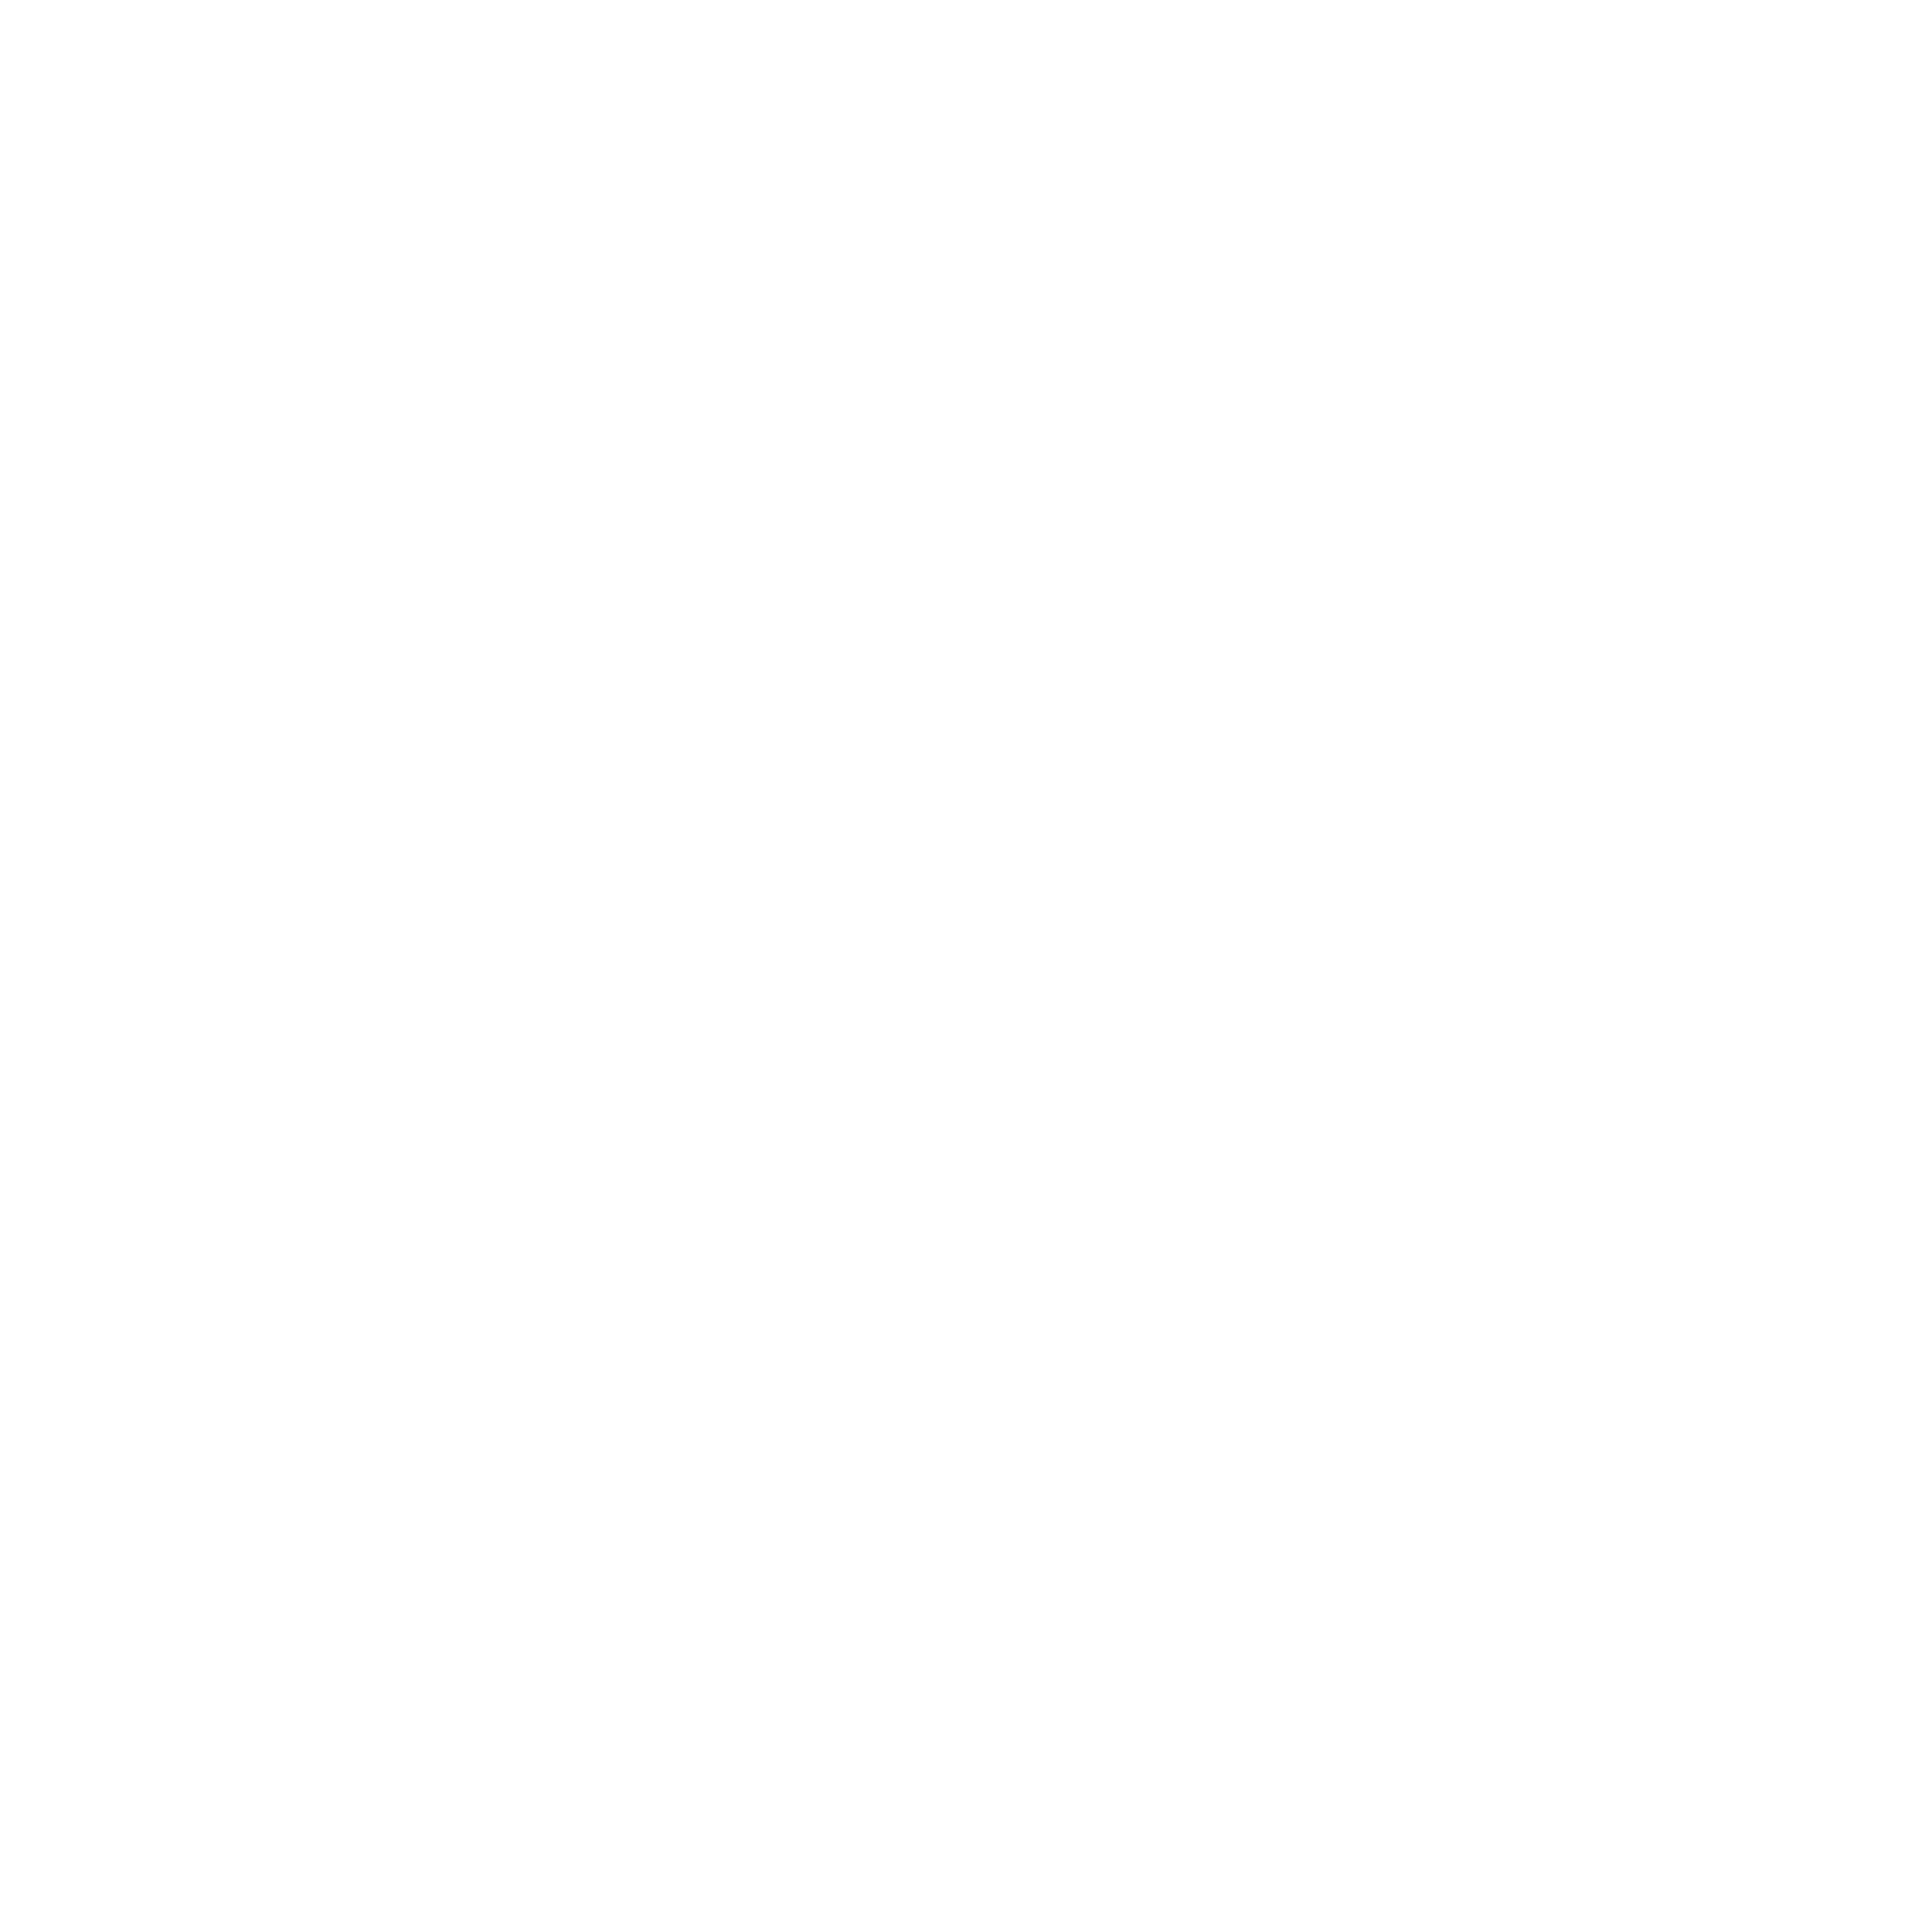 Laws clipart legal service. Bdm boylan services cork